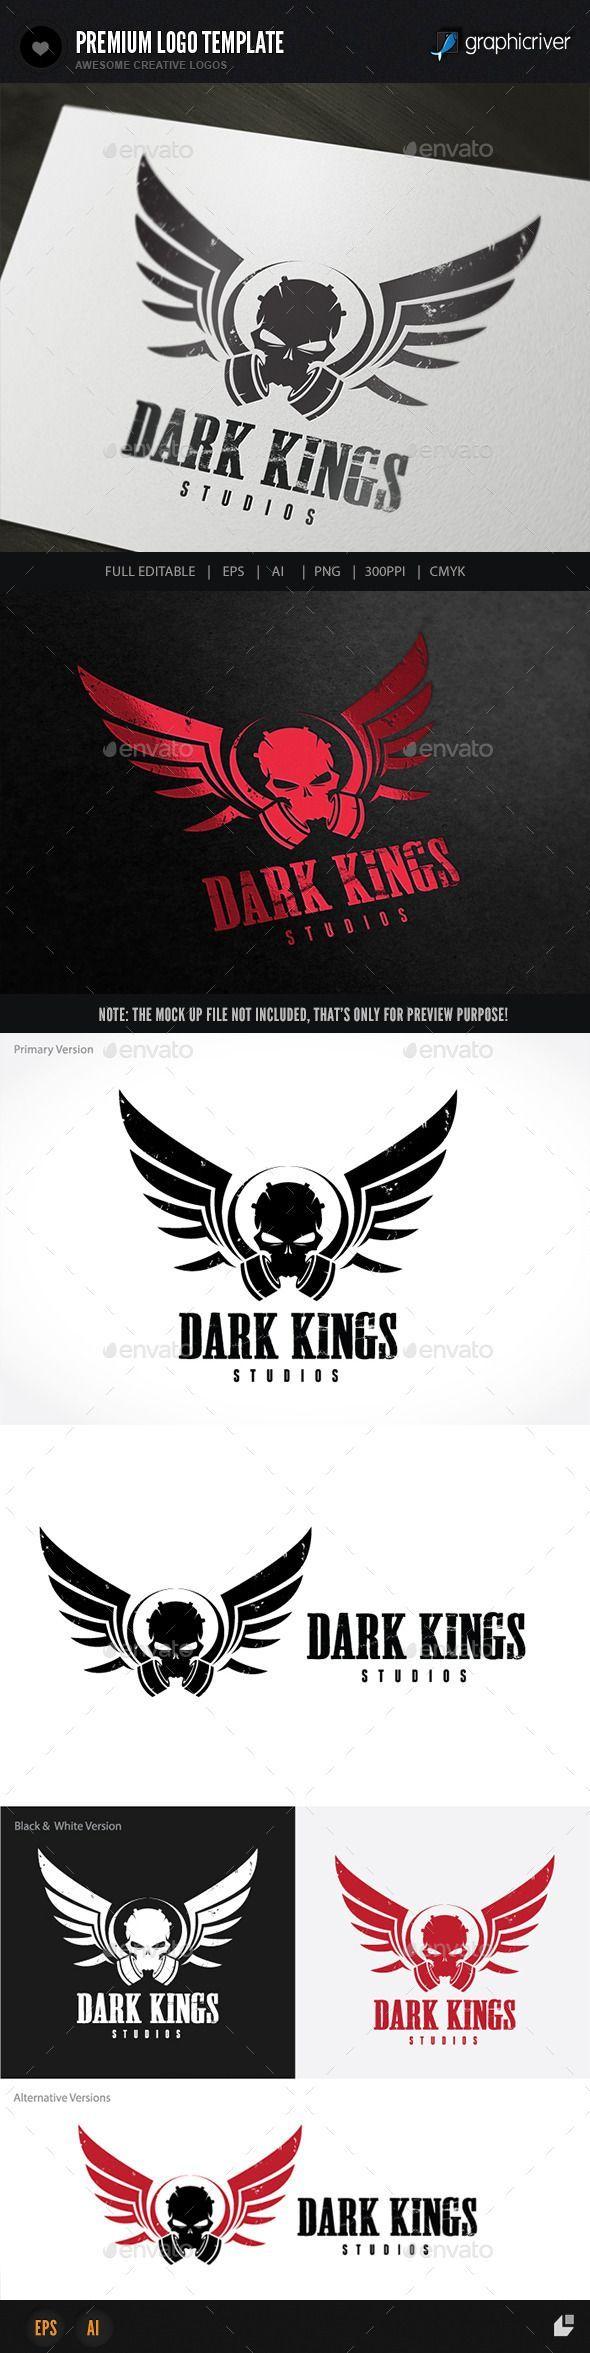 Dark Kings Logo Template